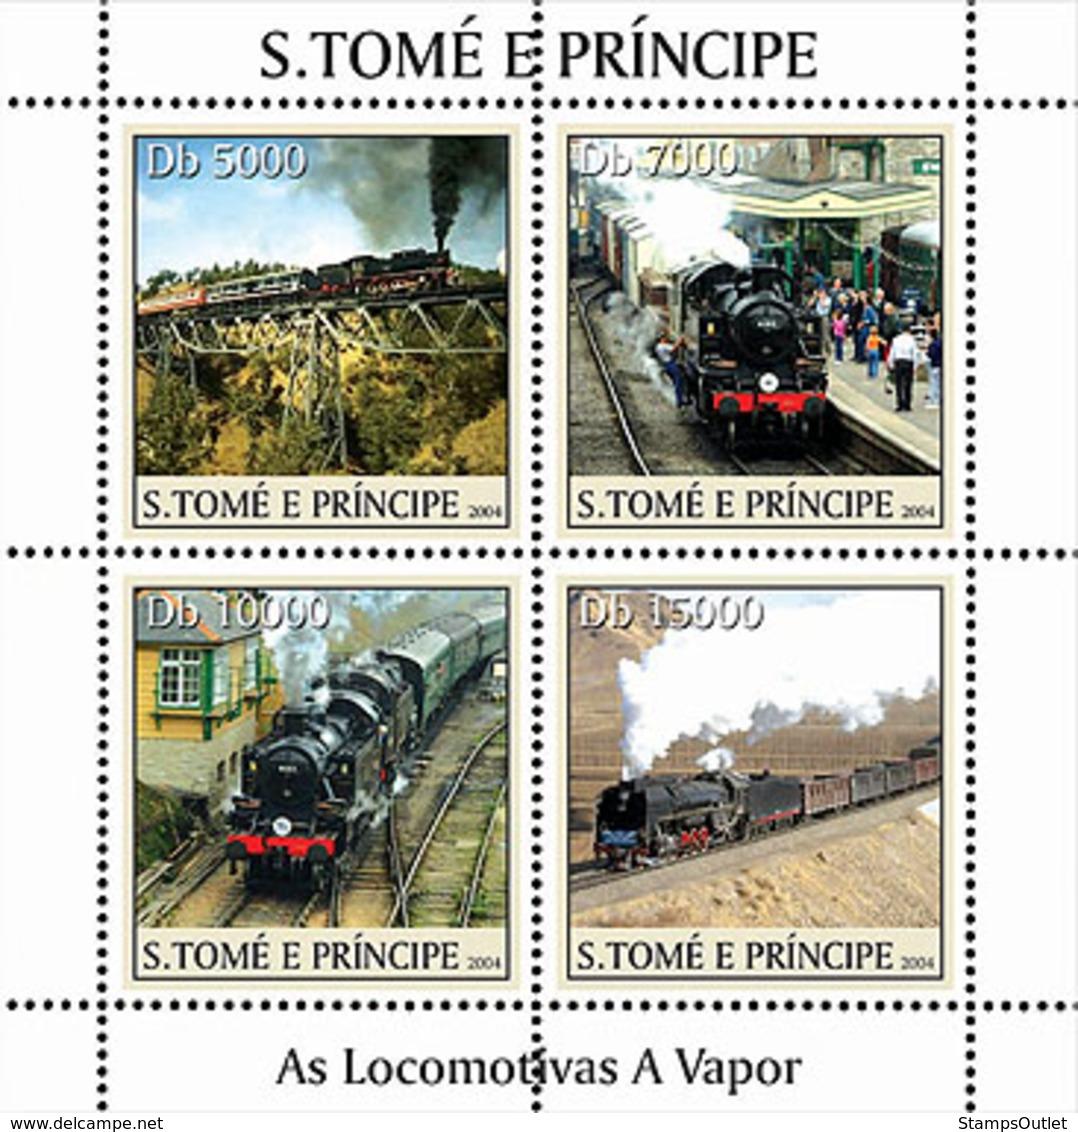 S. TOME & PRINCIPE 2004 - Locomotives 4v - YT 1958-1961,  Mi 2629-2632 - Sao Tome En Principe